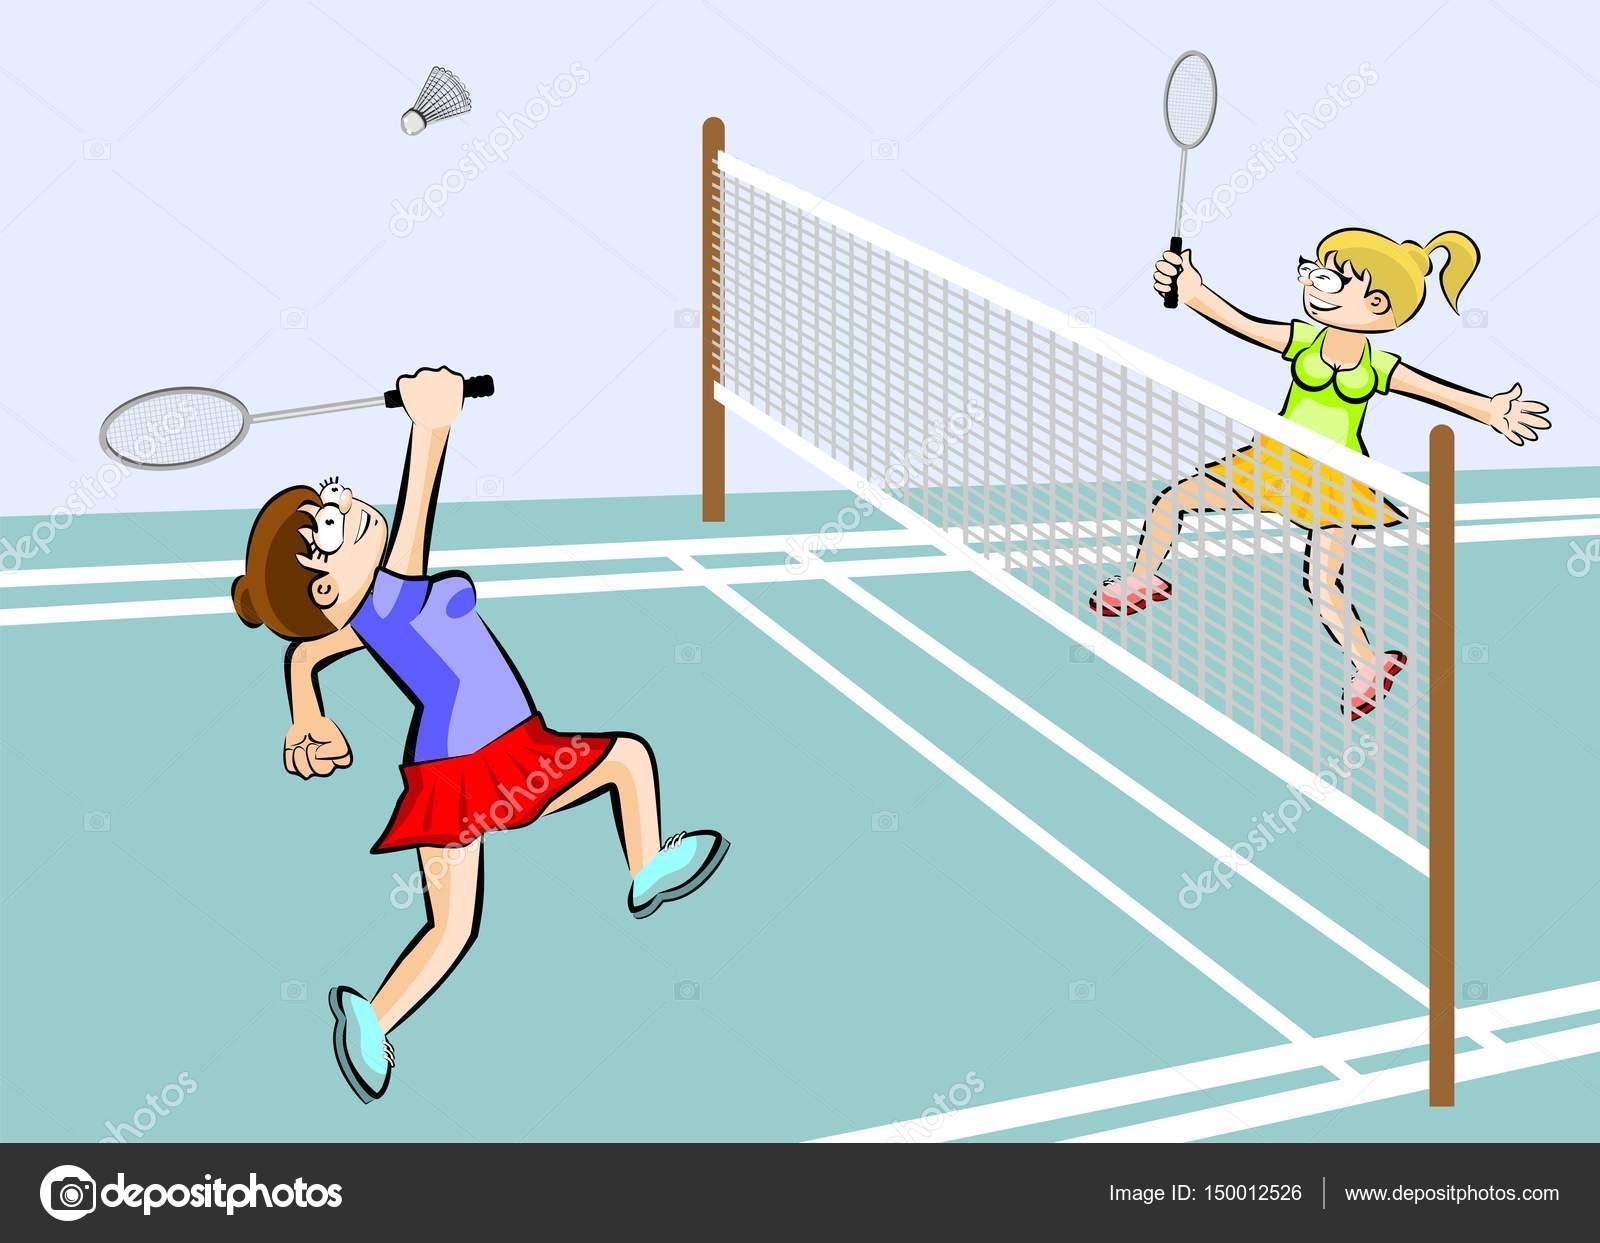 Frauen Spielen Badminton Stockvektor Photoestelar 150012526